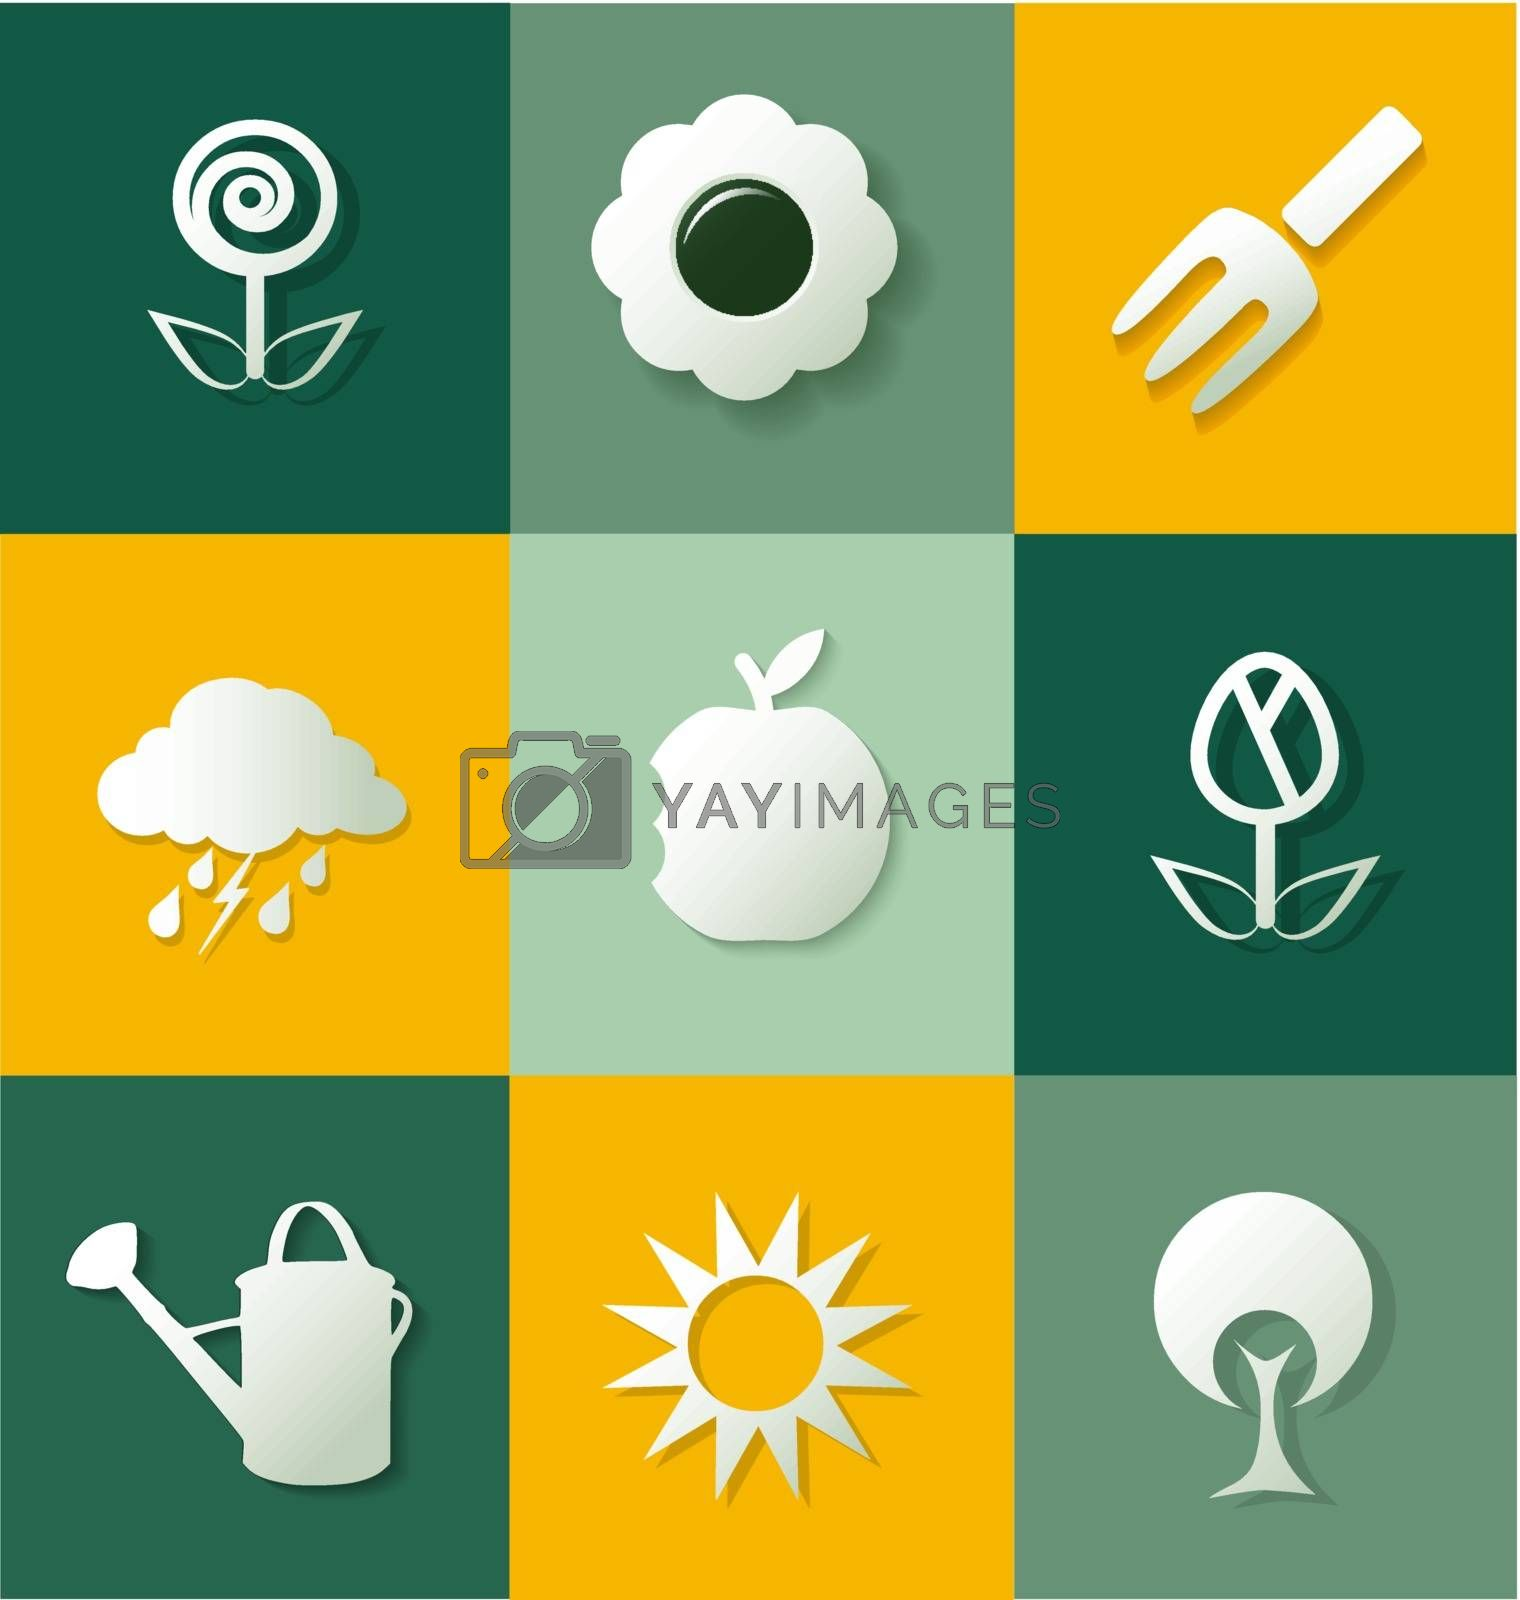 Set of gardening flat icons for creative design tasks